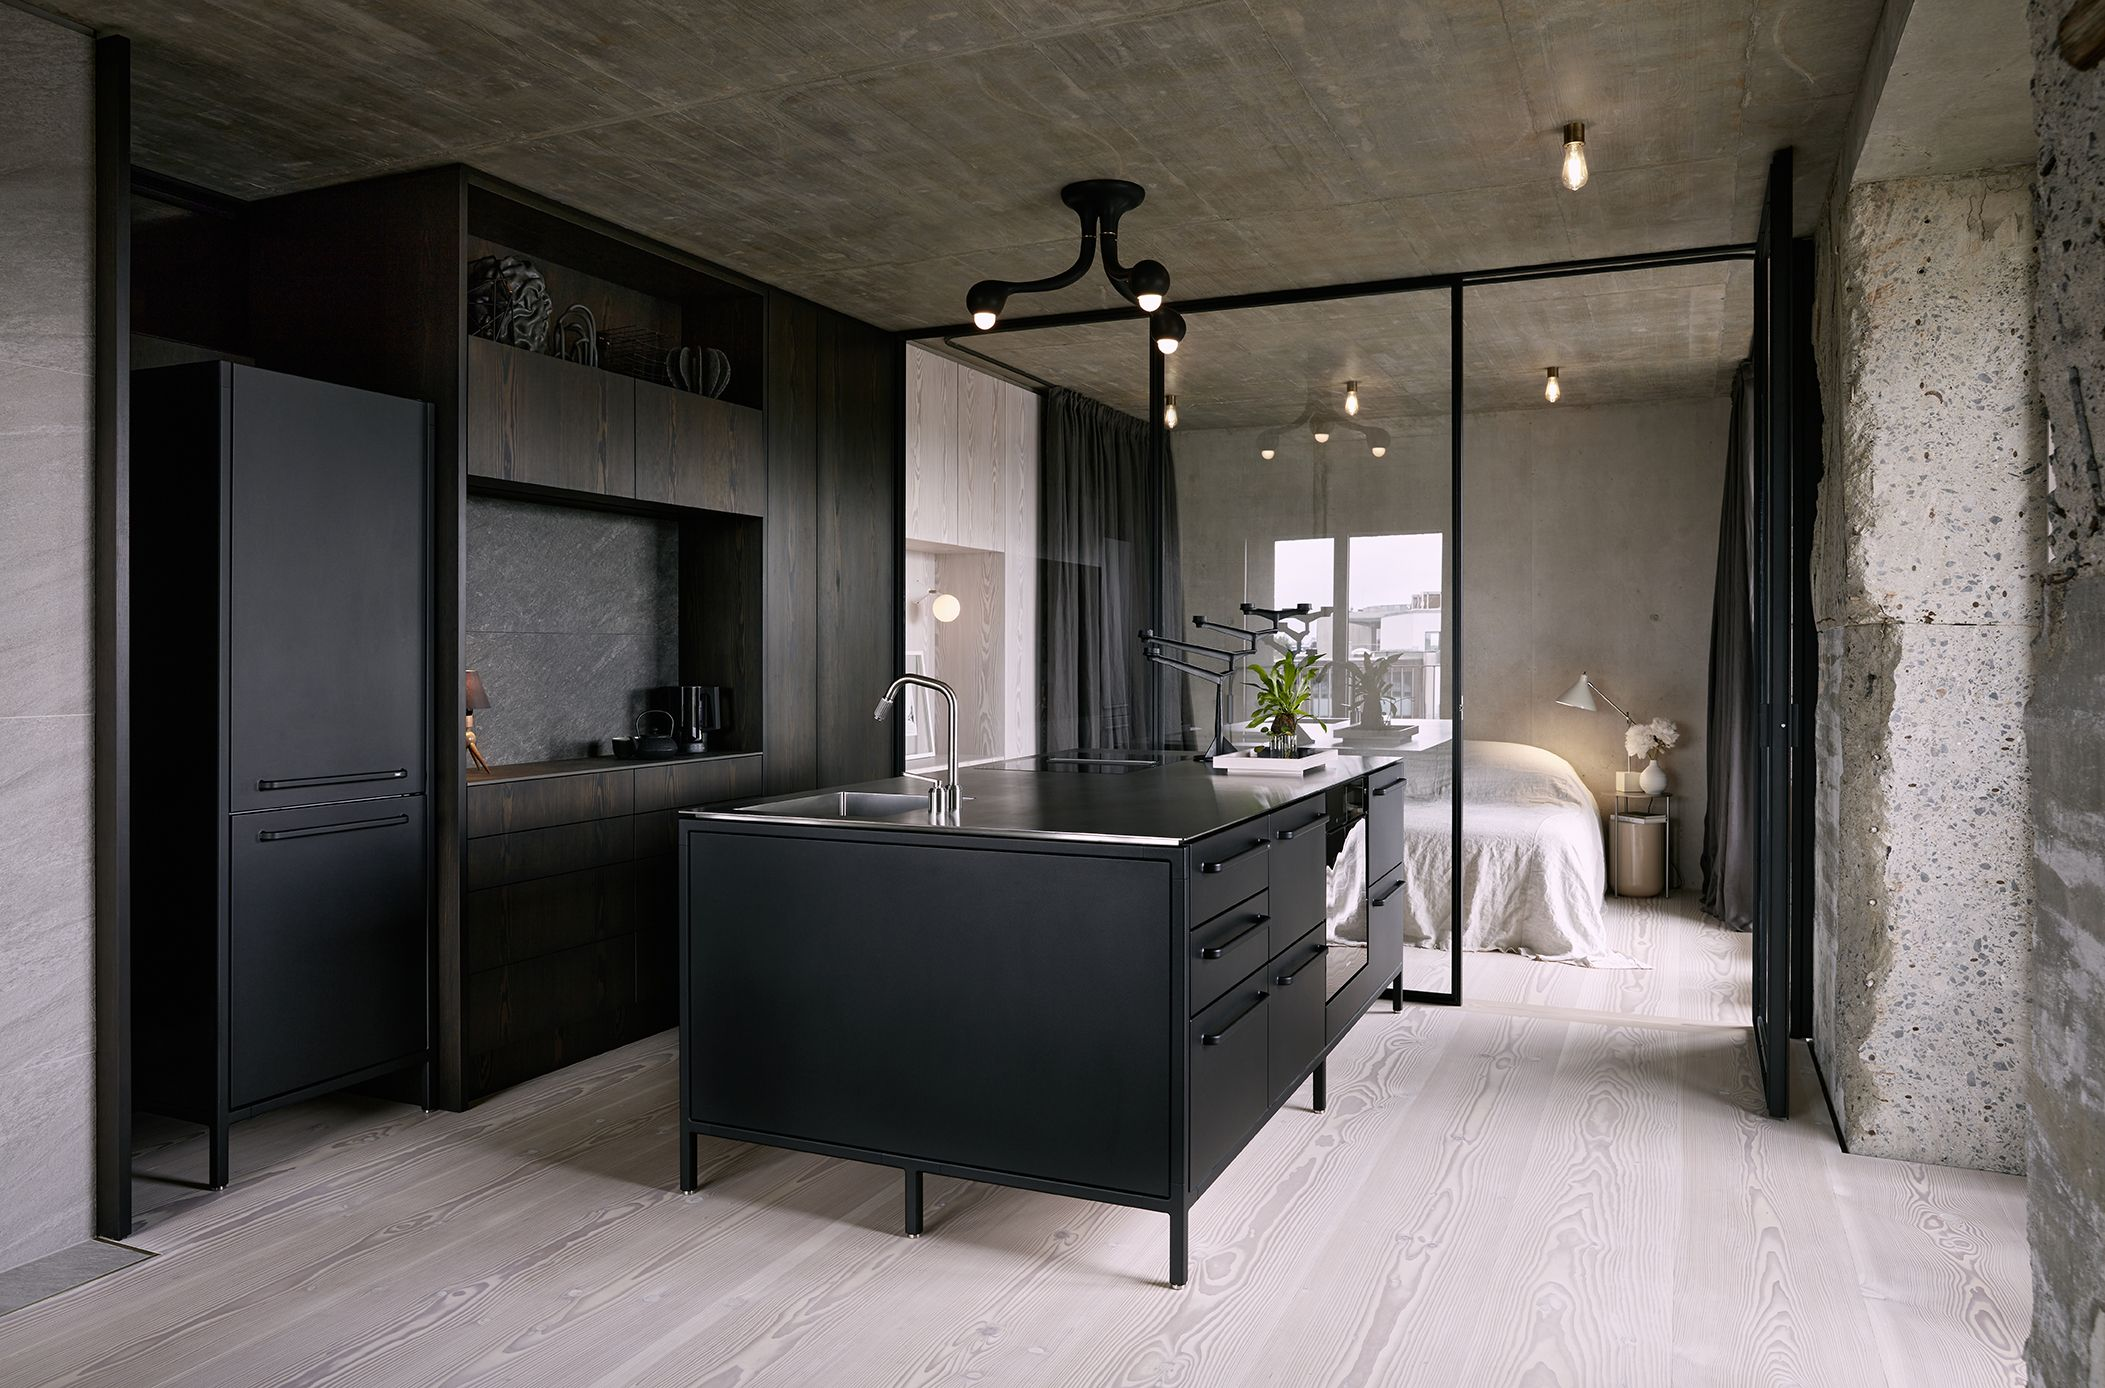 Vipp Kitchen Apartment Design Interior Interior Design Kitchen